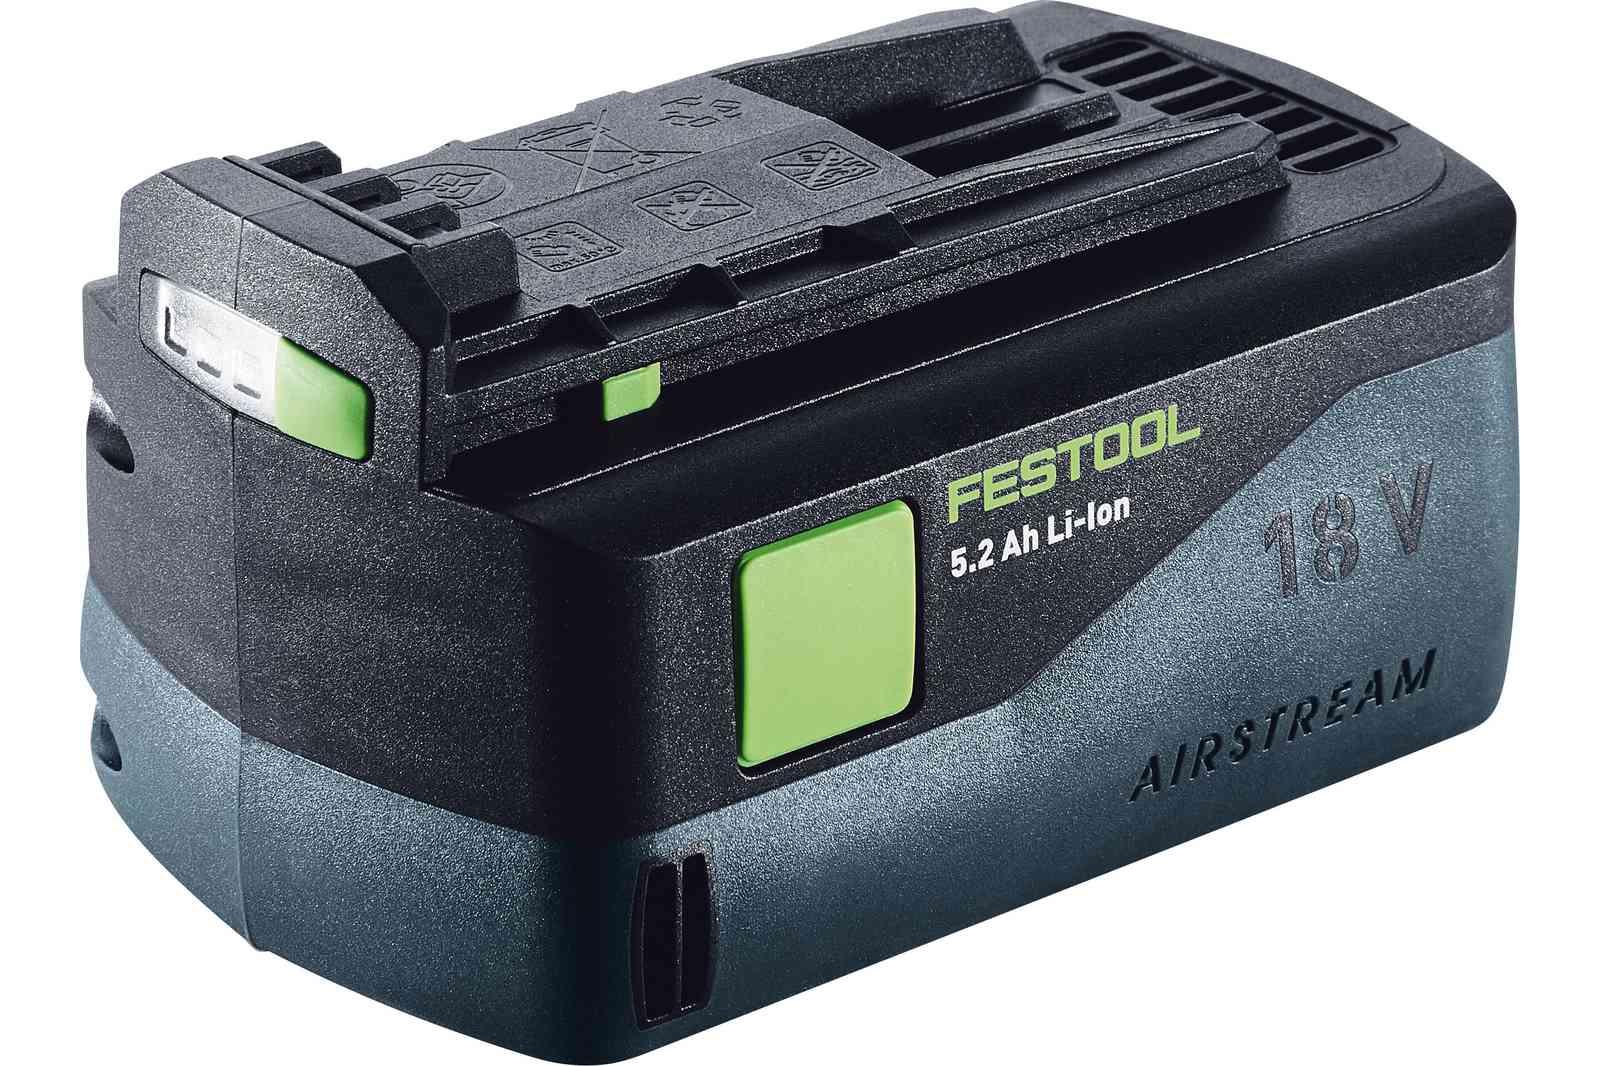 Batterie 5,2 Ah Festool